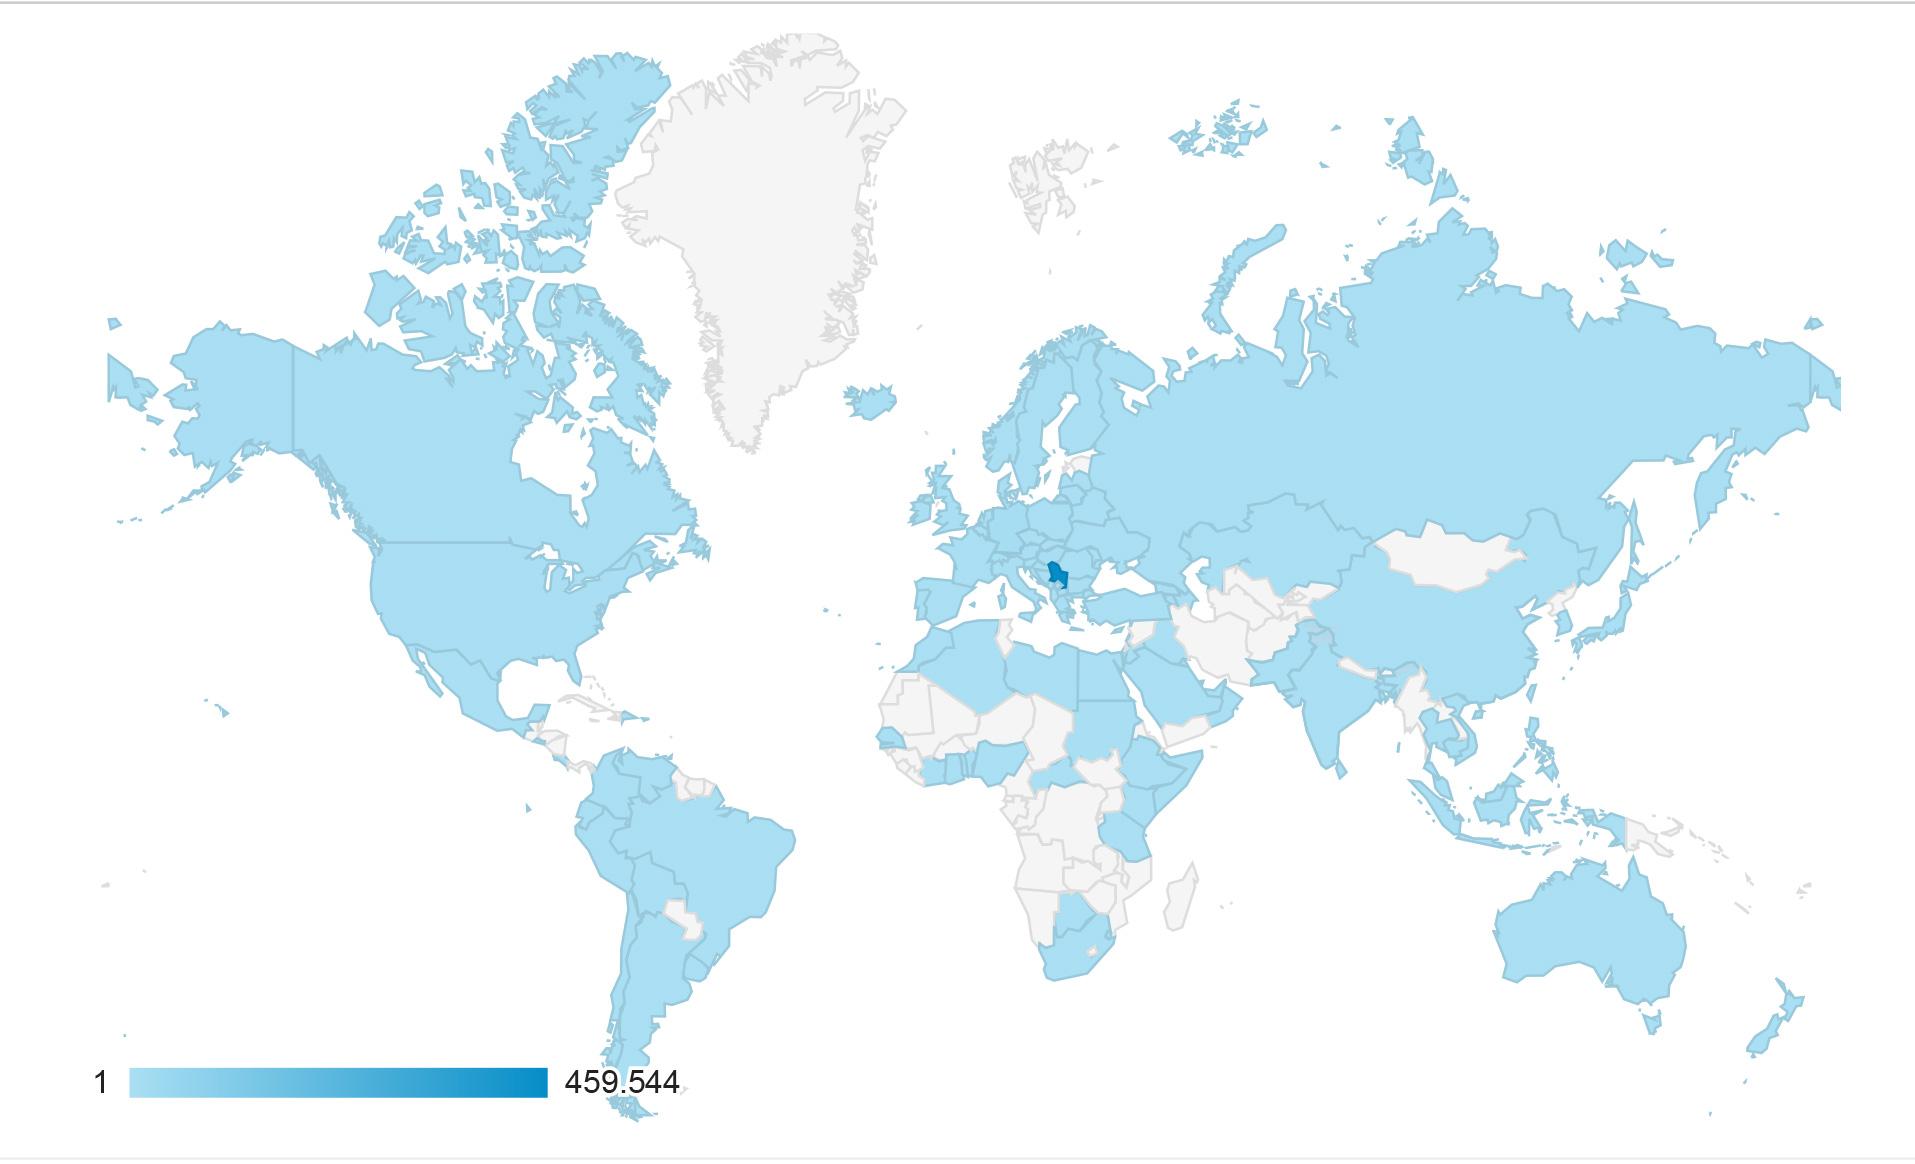 Zemlje iz kojih je posećen portal MojBečej u 2016. godini | Izvor: Google Analytics za portal MojBečej